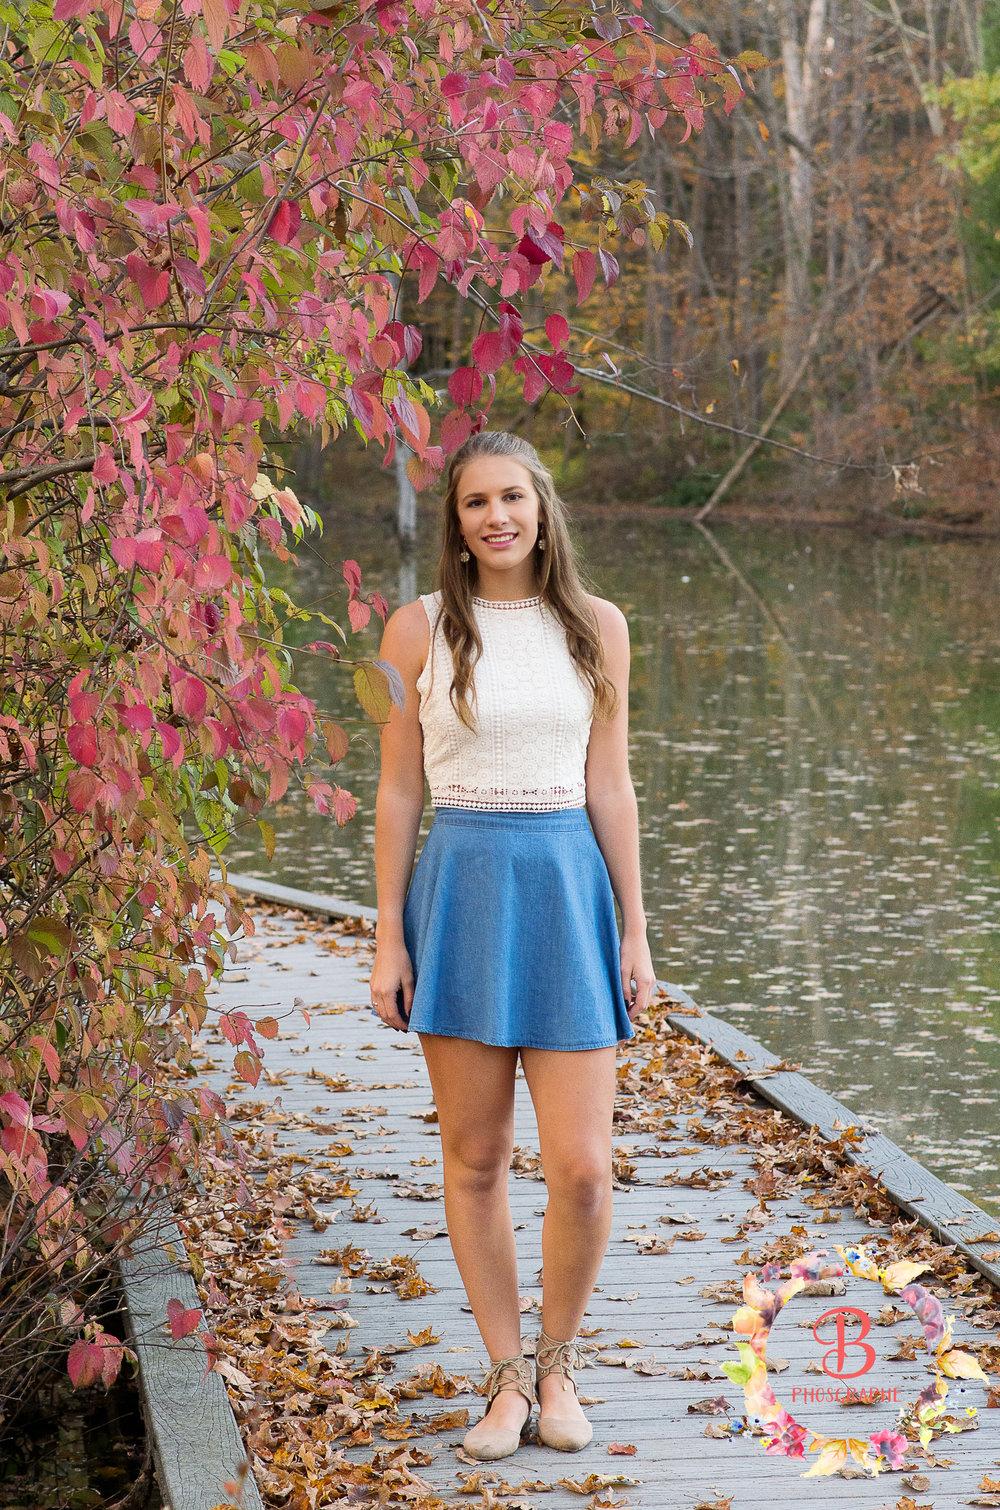 class of 2017, senior photography, senior girl, senior portrait, betsy pittman, bphosgraphe, b phosgraphe, cincinnati, OH-9.jpg